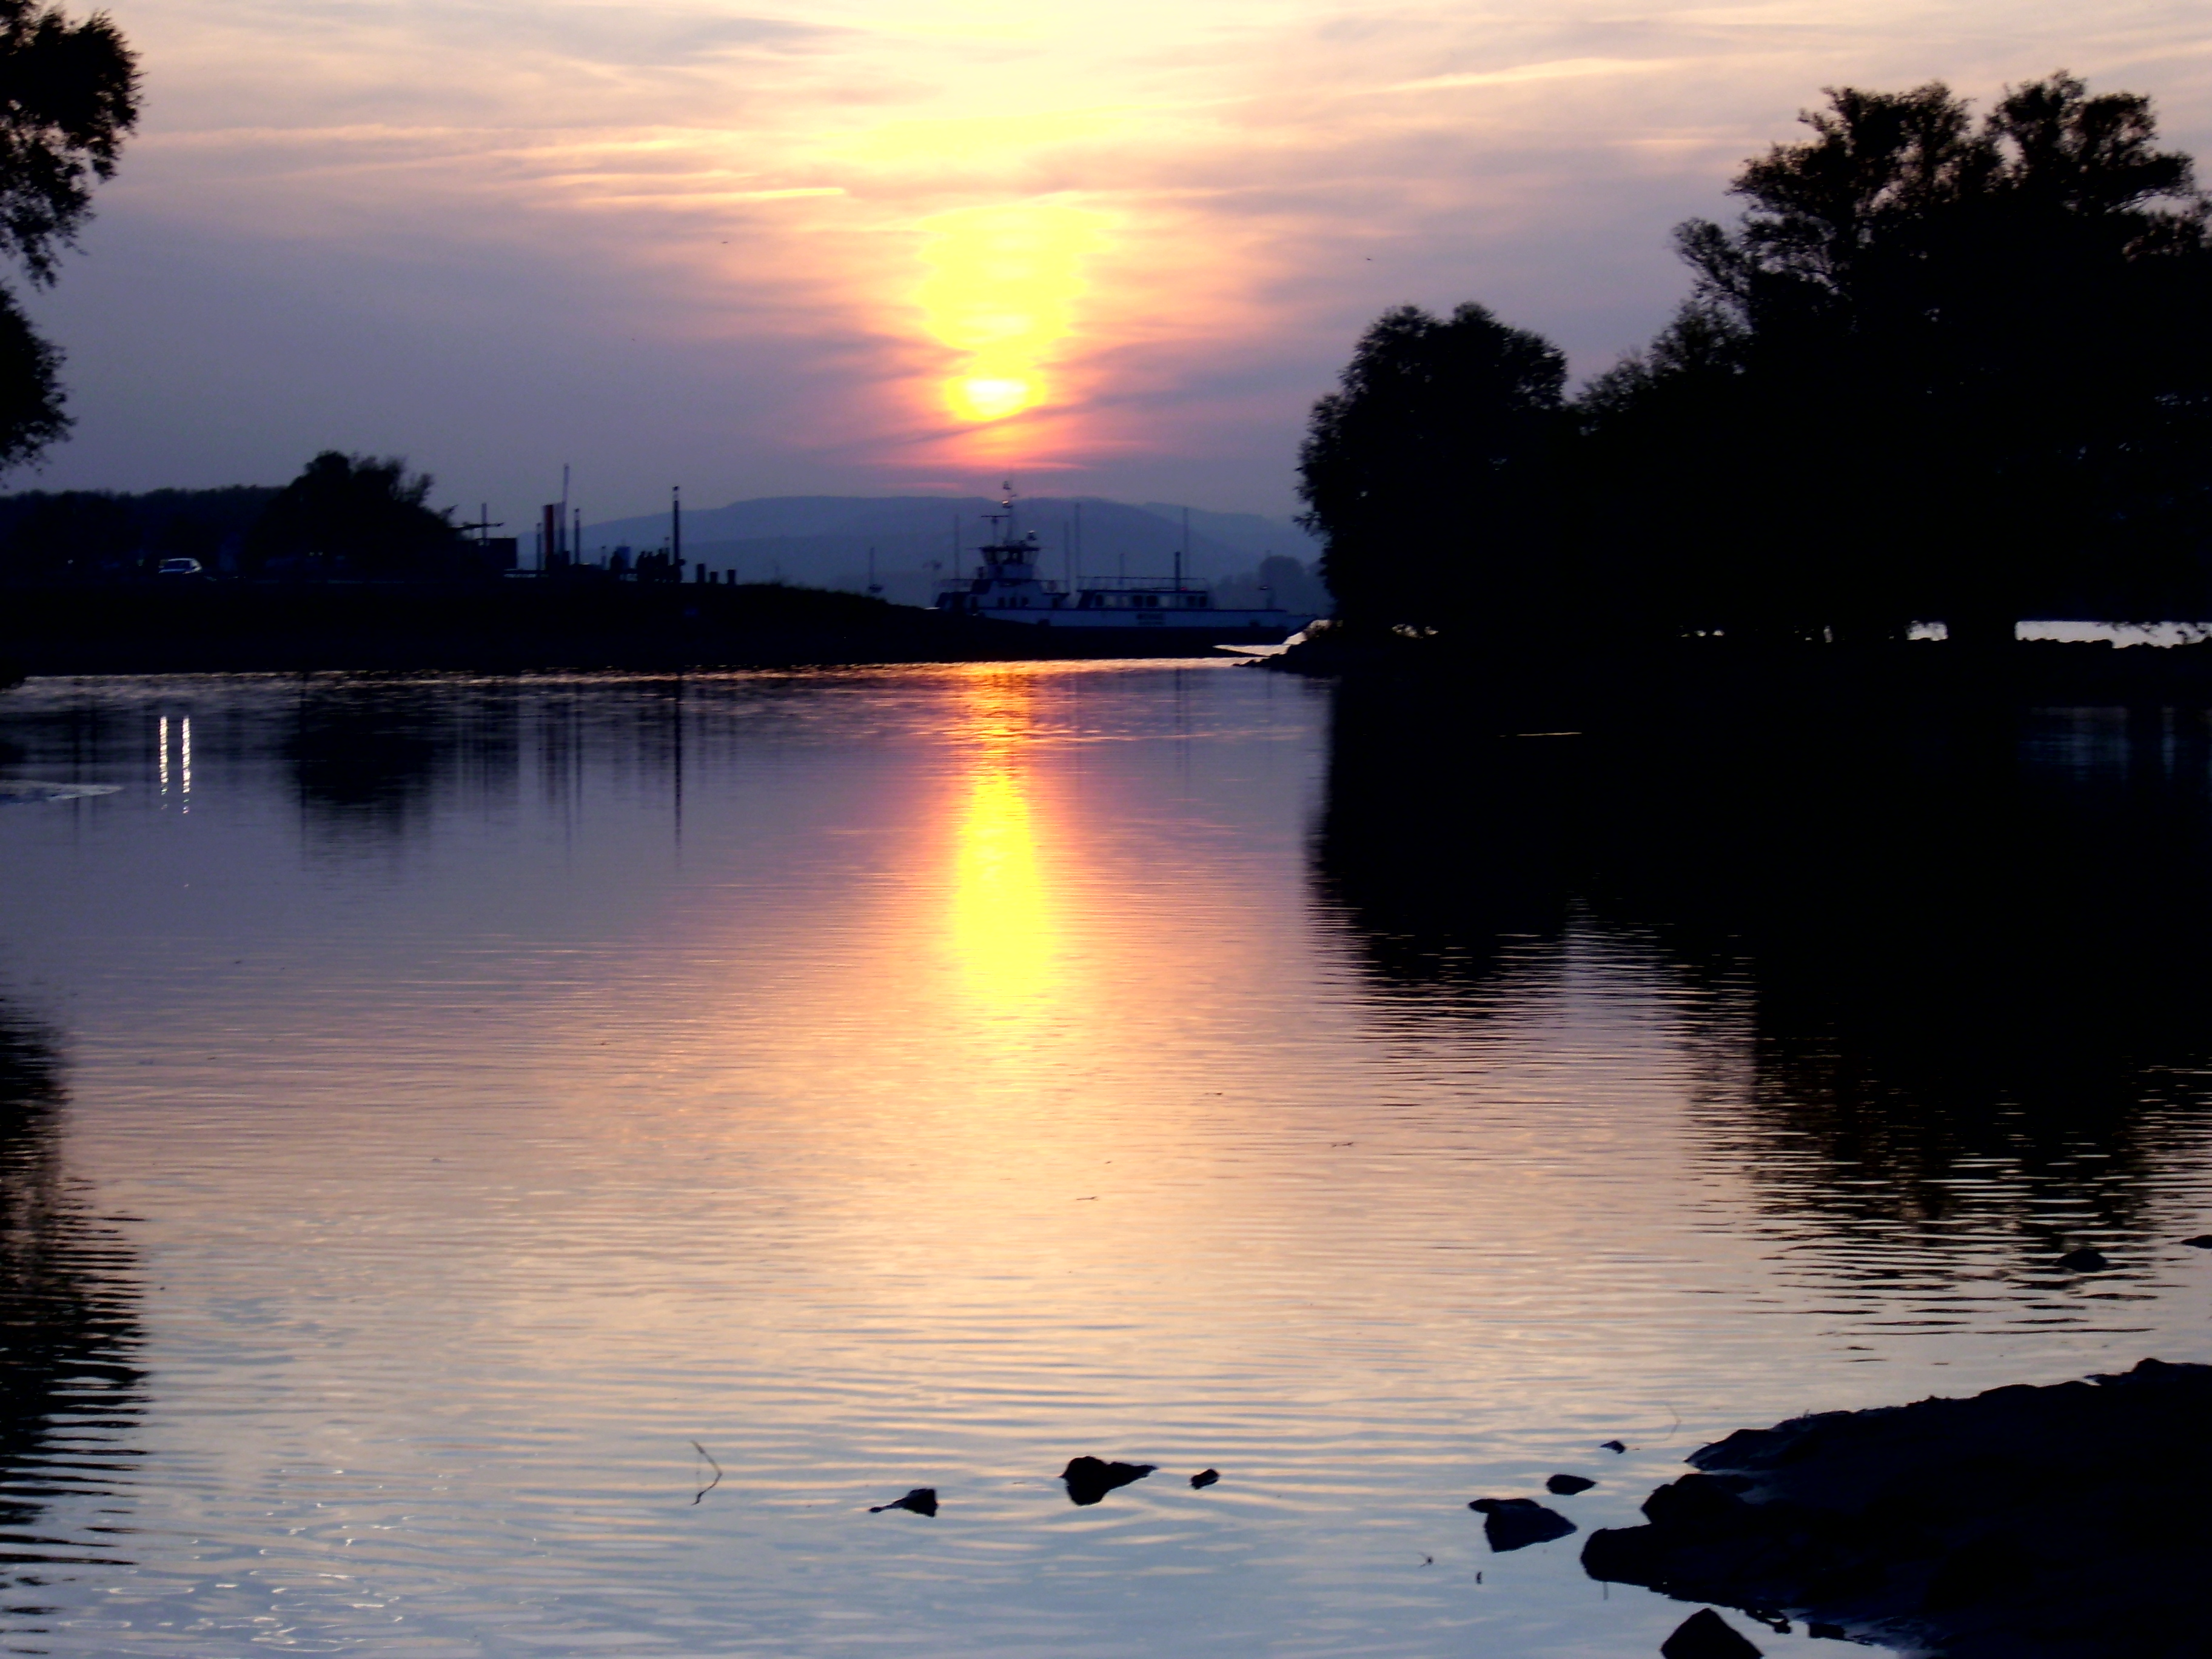 File:romantische abendsonne amrhein.jpg   wikimedia commons